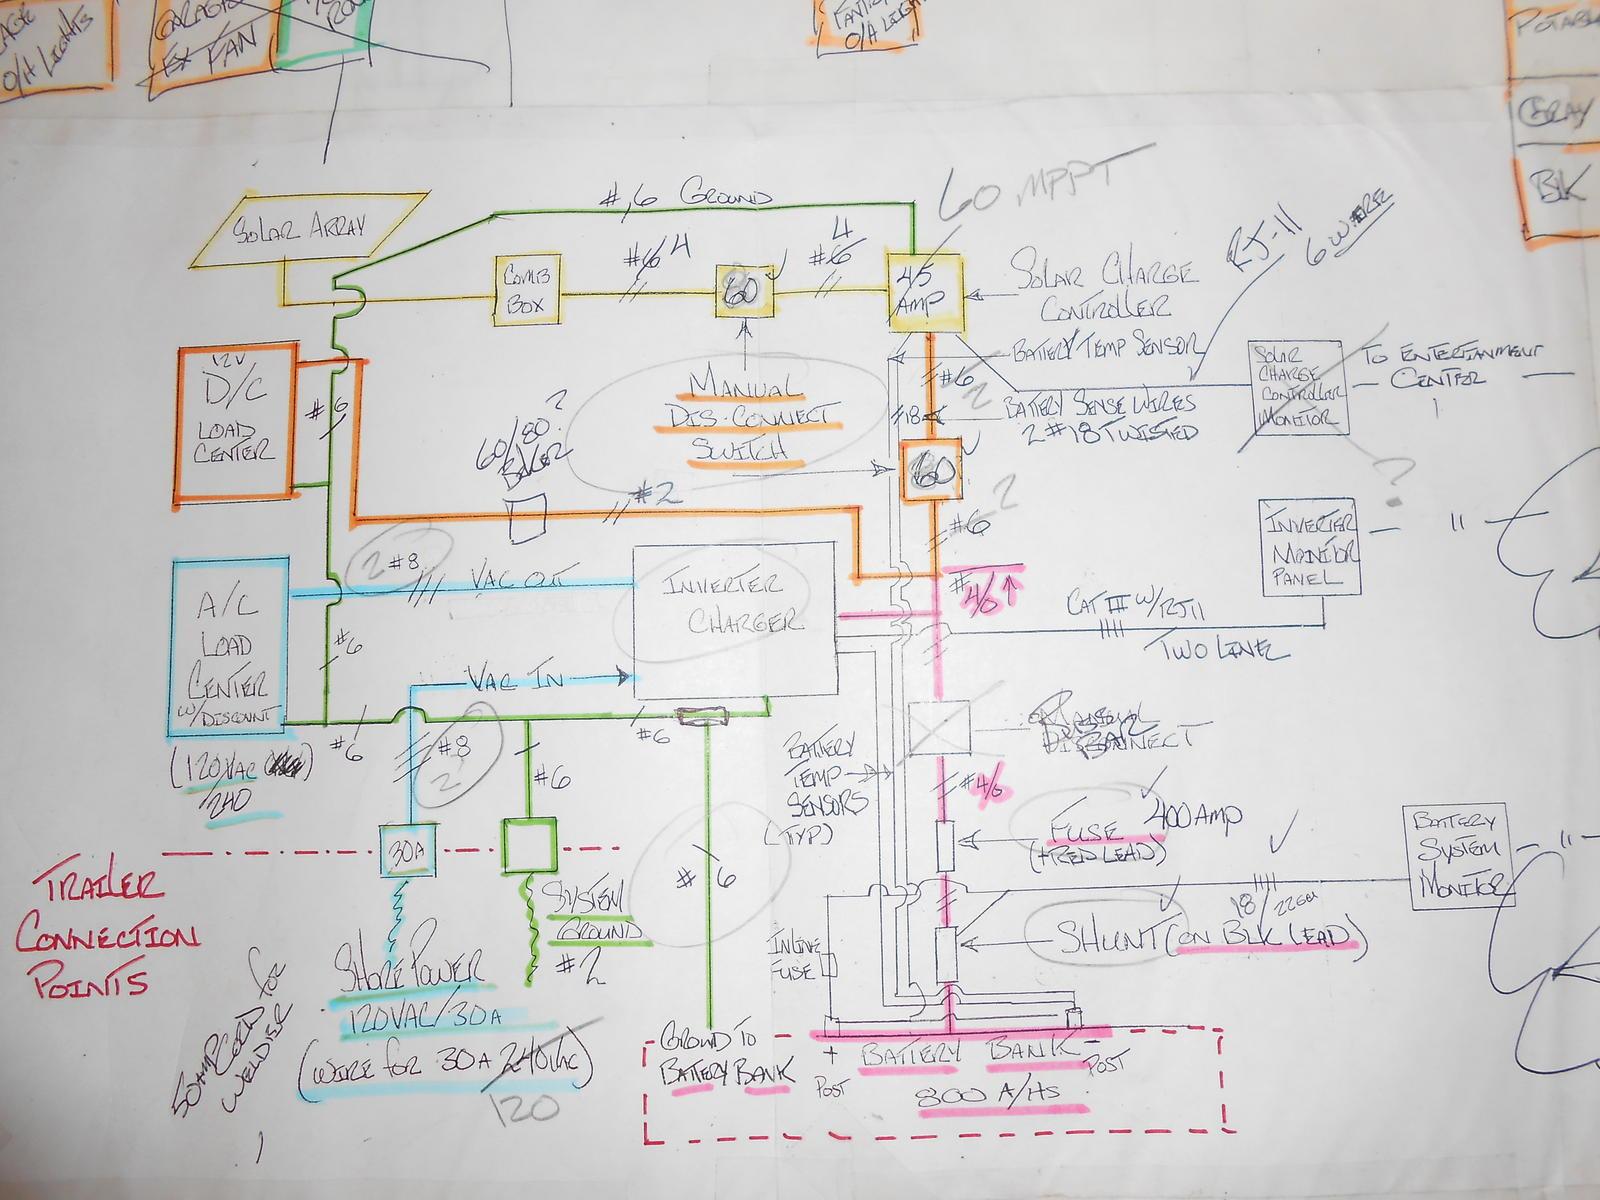 wiring diagram for 2007 dodge ram 2500 wiring get free image about wiring diagram